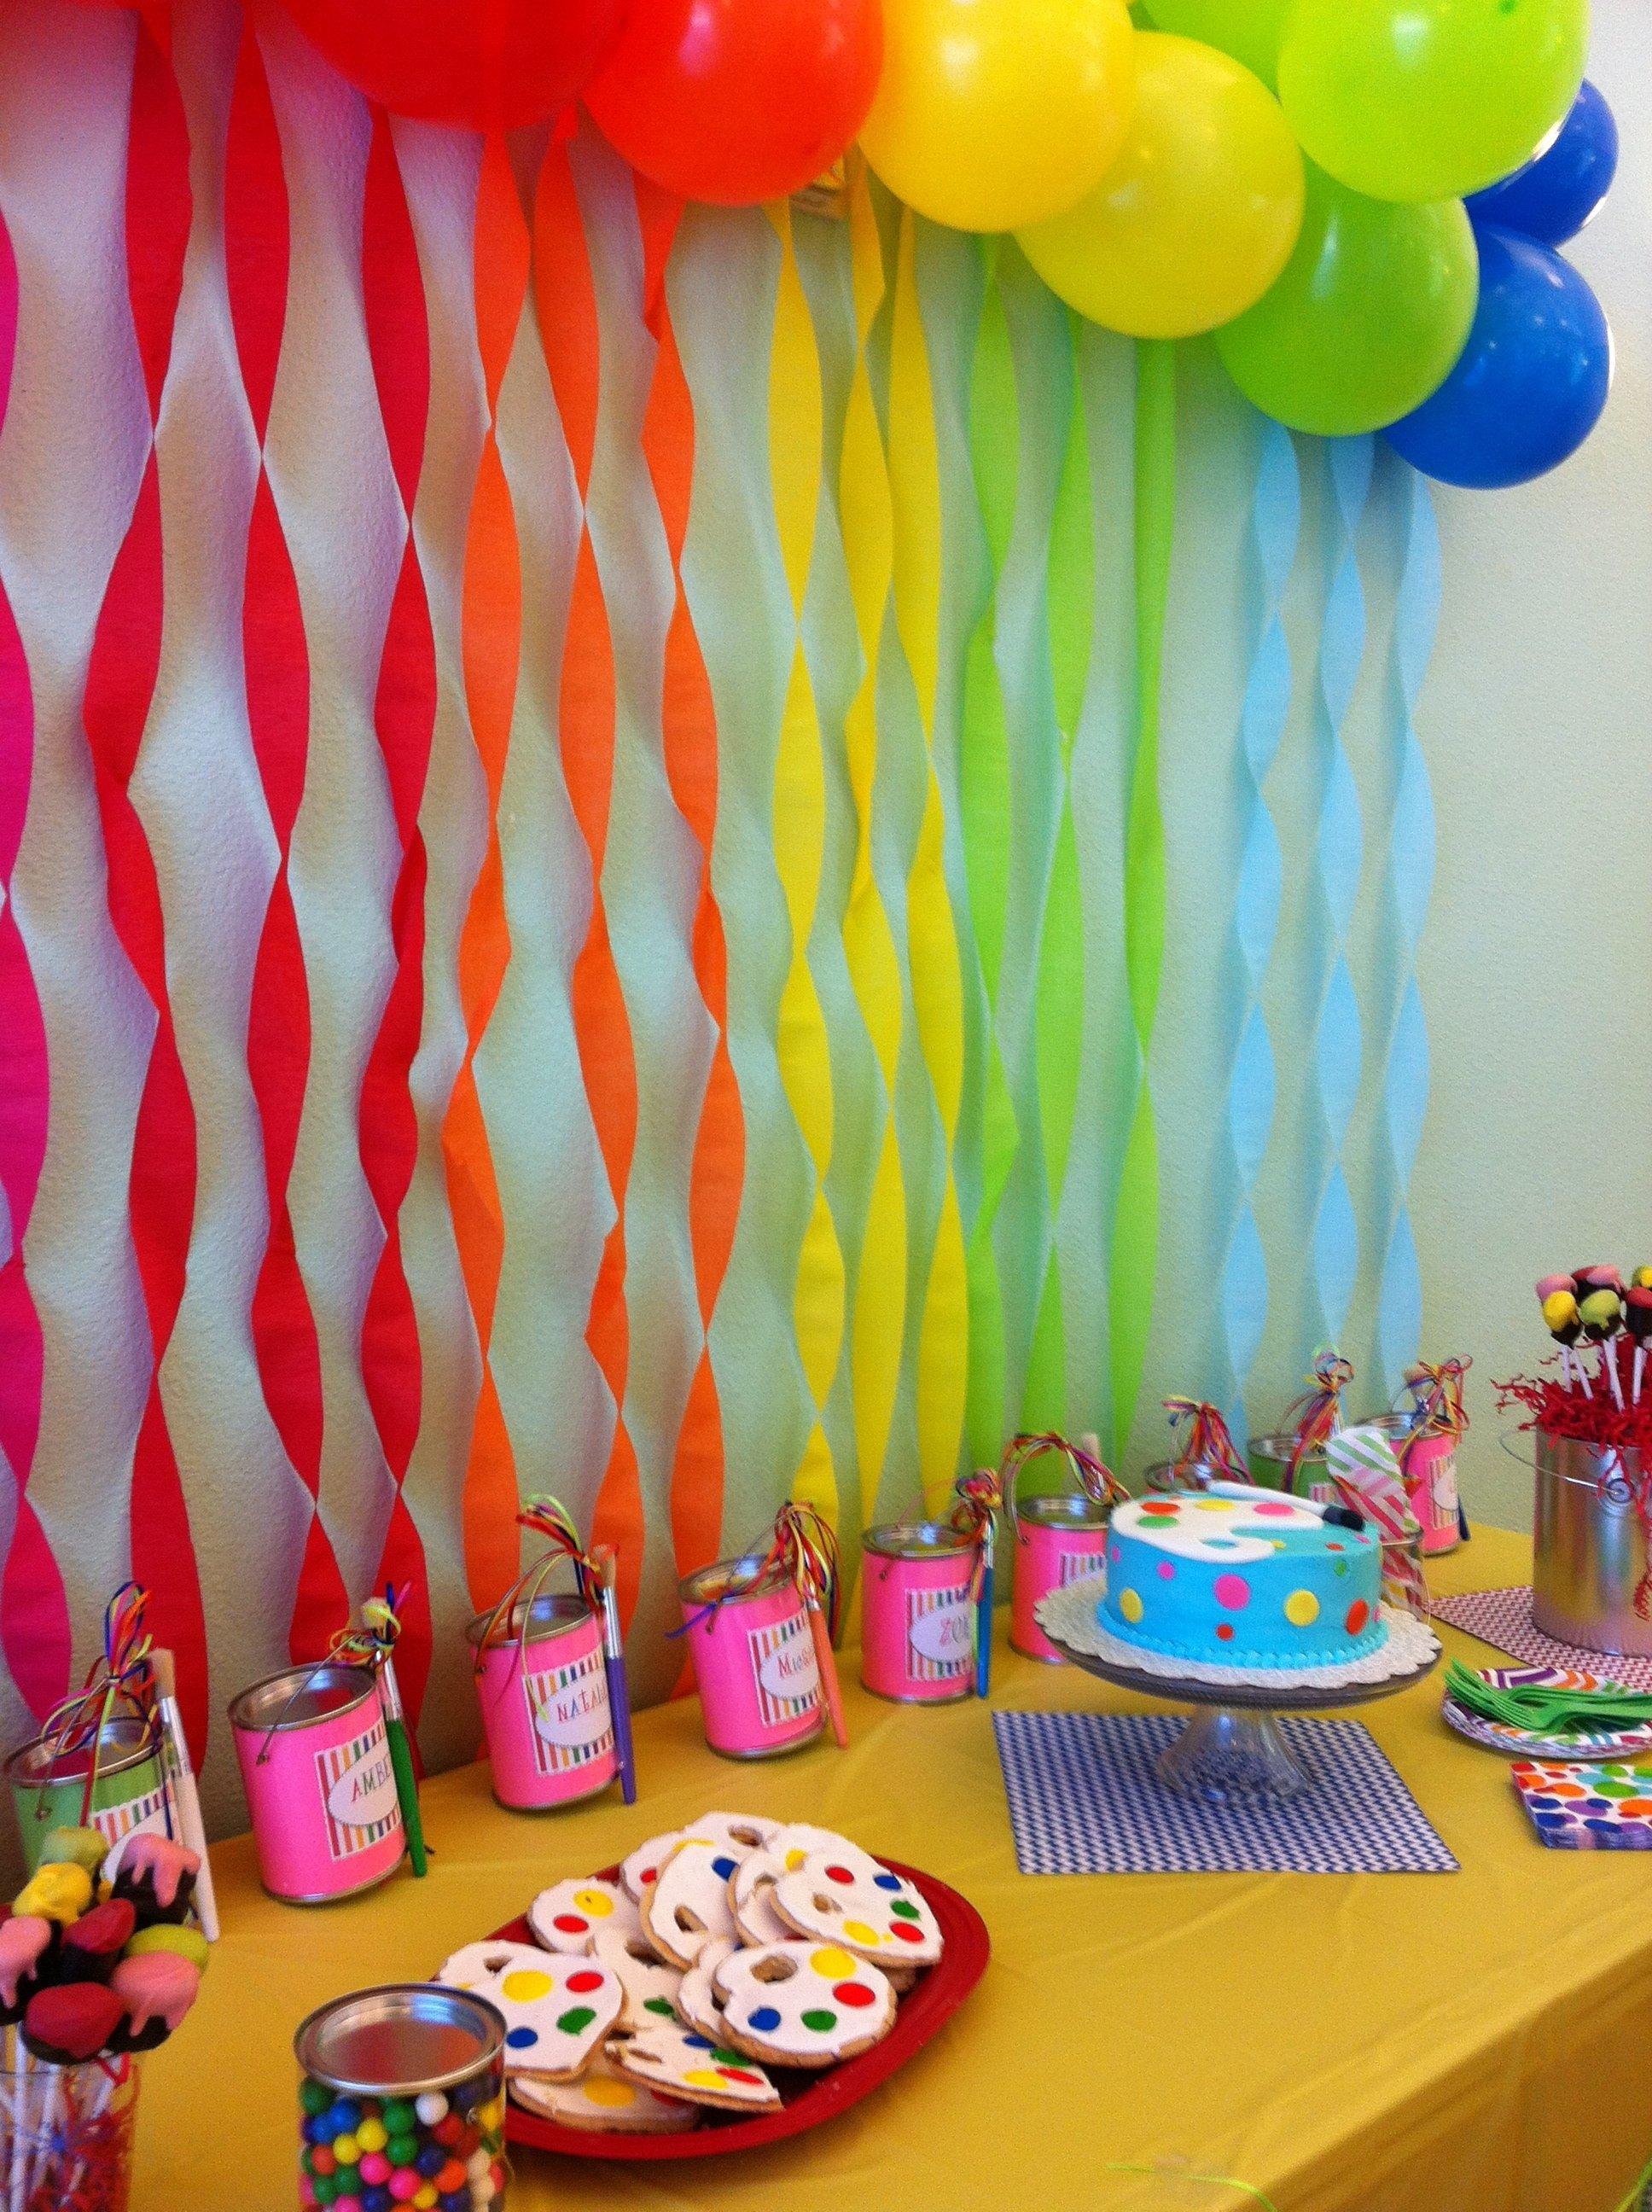 10 Fabulous 3 Year Old Girl Birthday Ideas 8 year old girl birthday art party pinterest fresh ideas for 7 boy 3